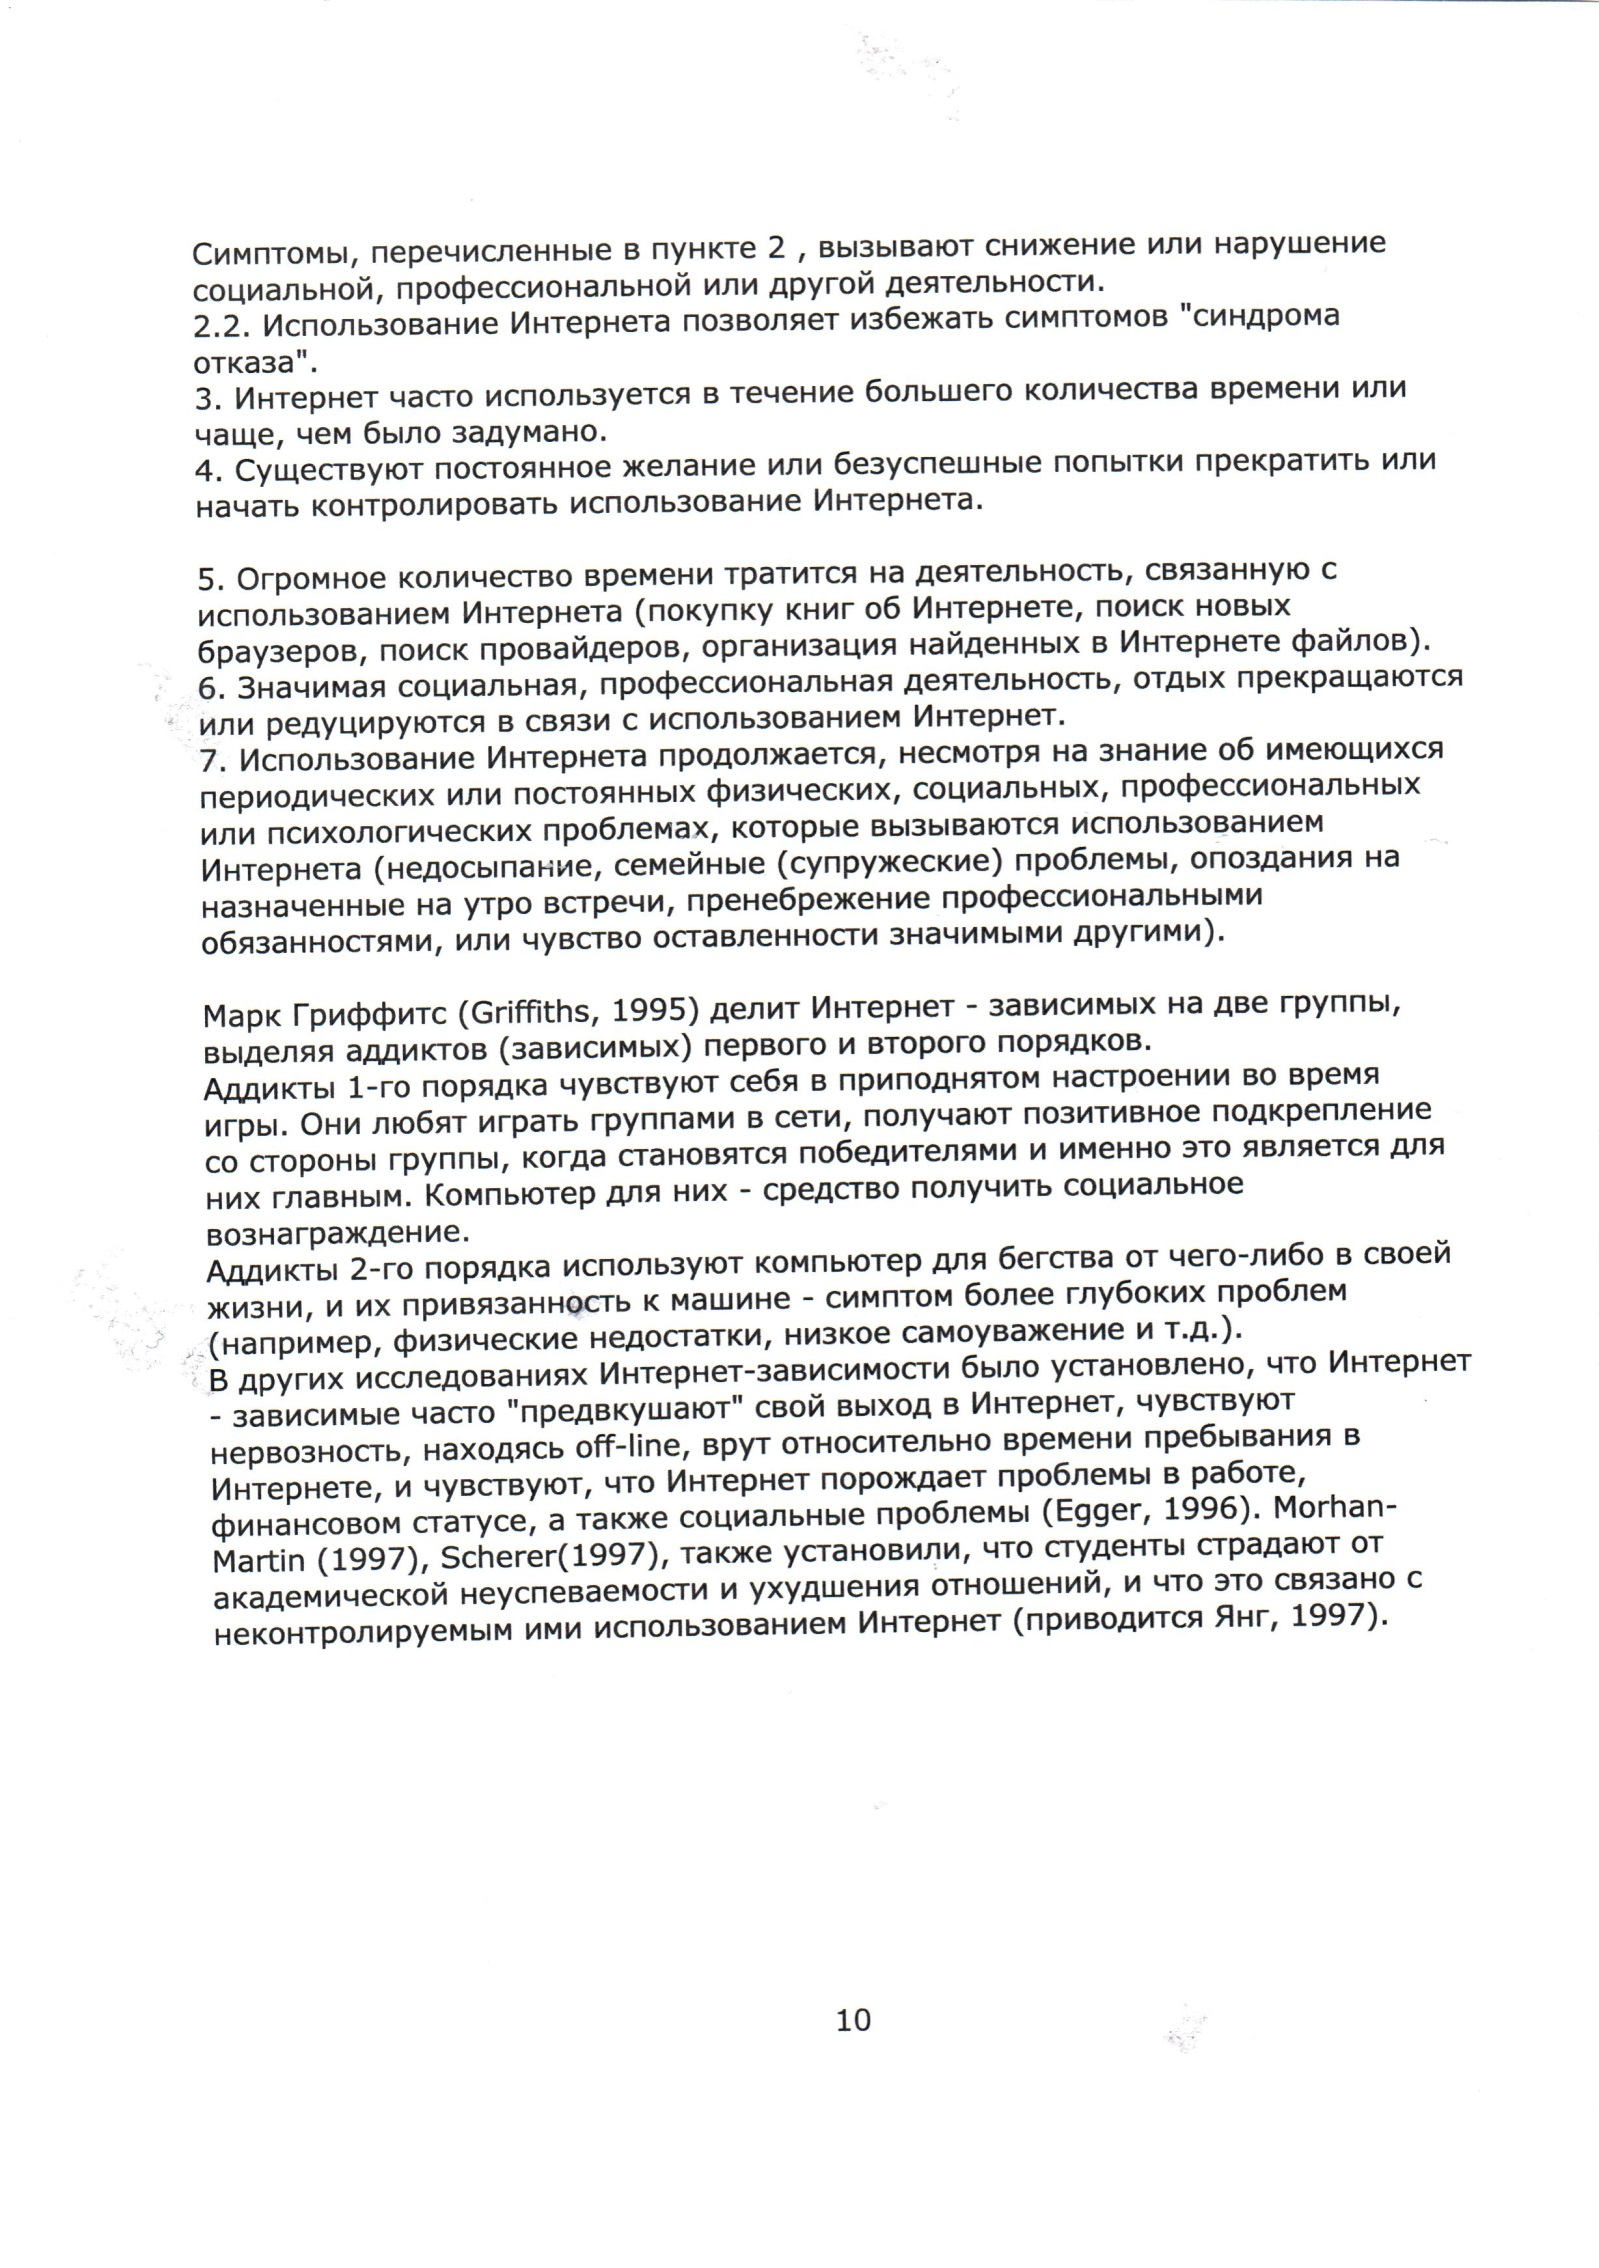 C:\Users\Ирина\Documents\Panasonic\MFS\Scan\20160225_104831.jpg